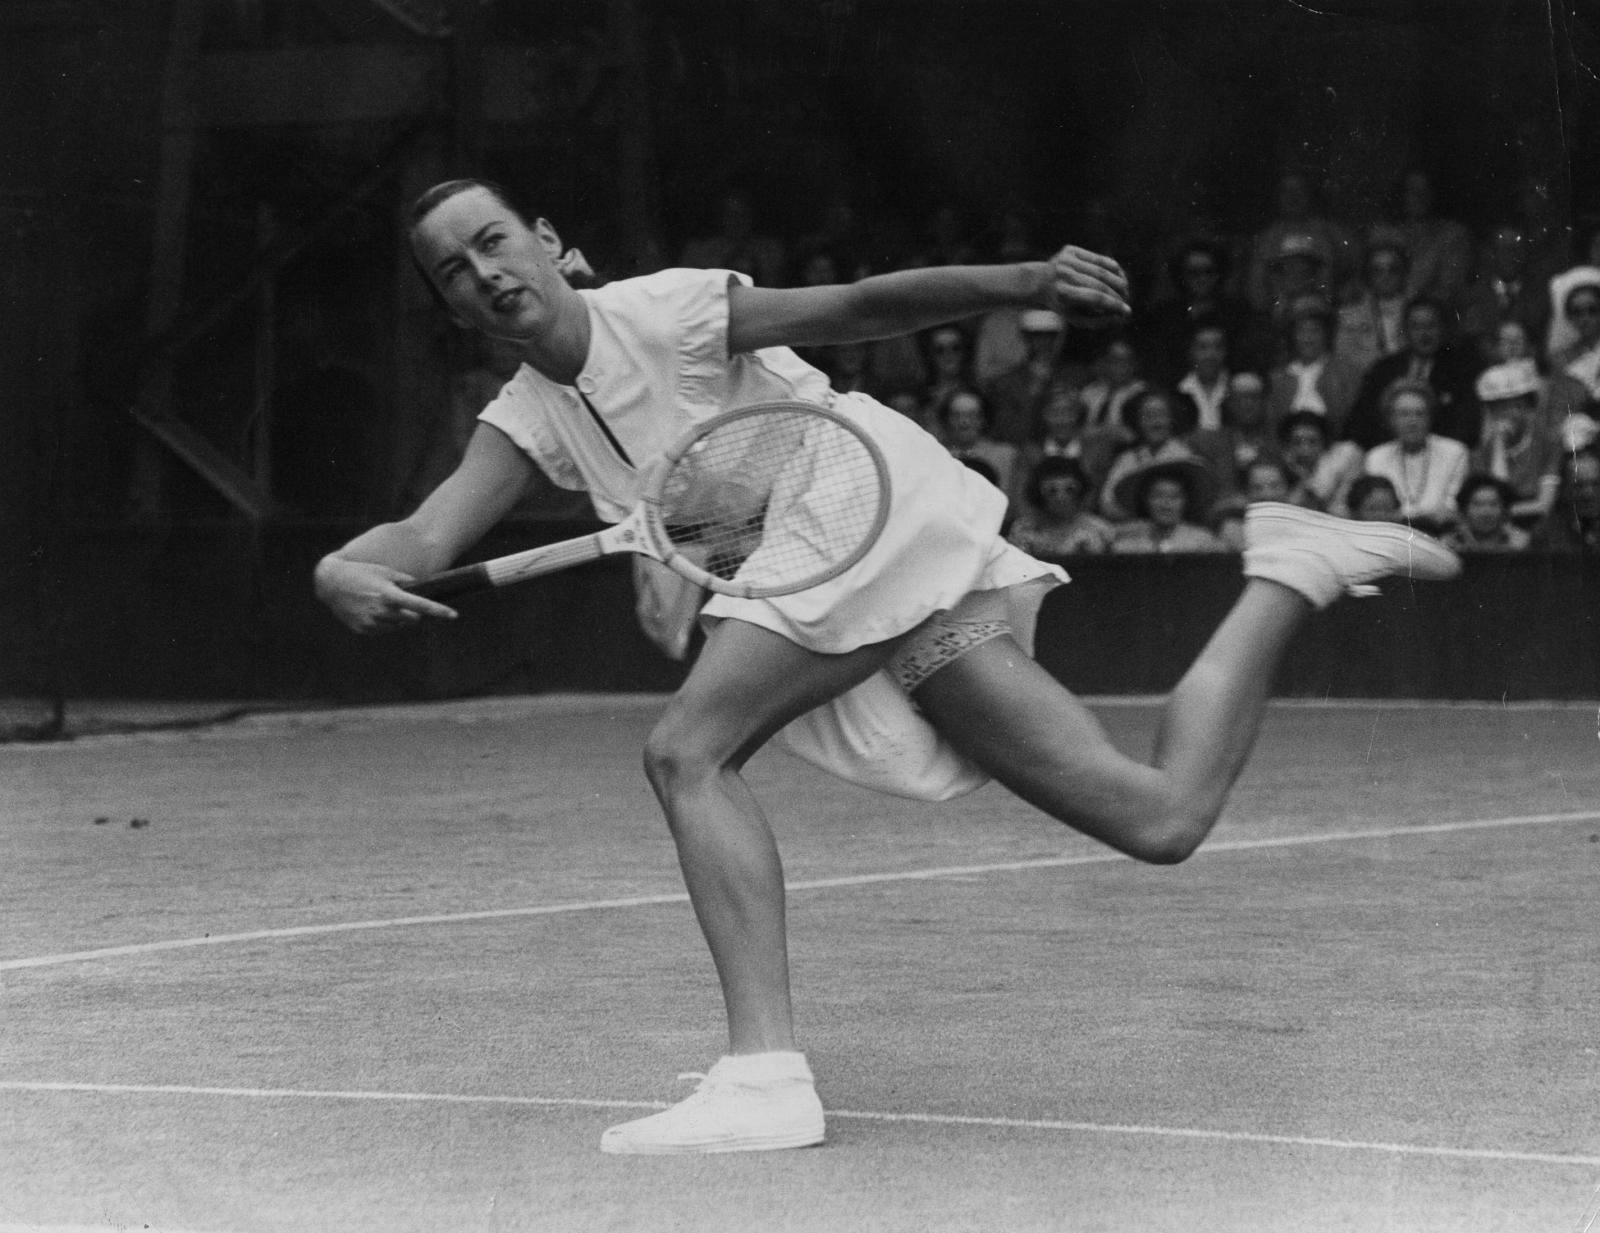 Wimbledon tennis controversy